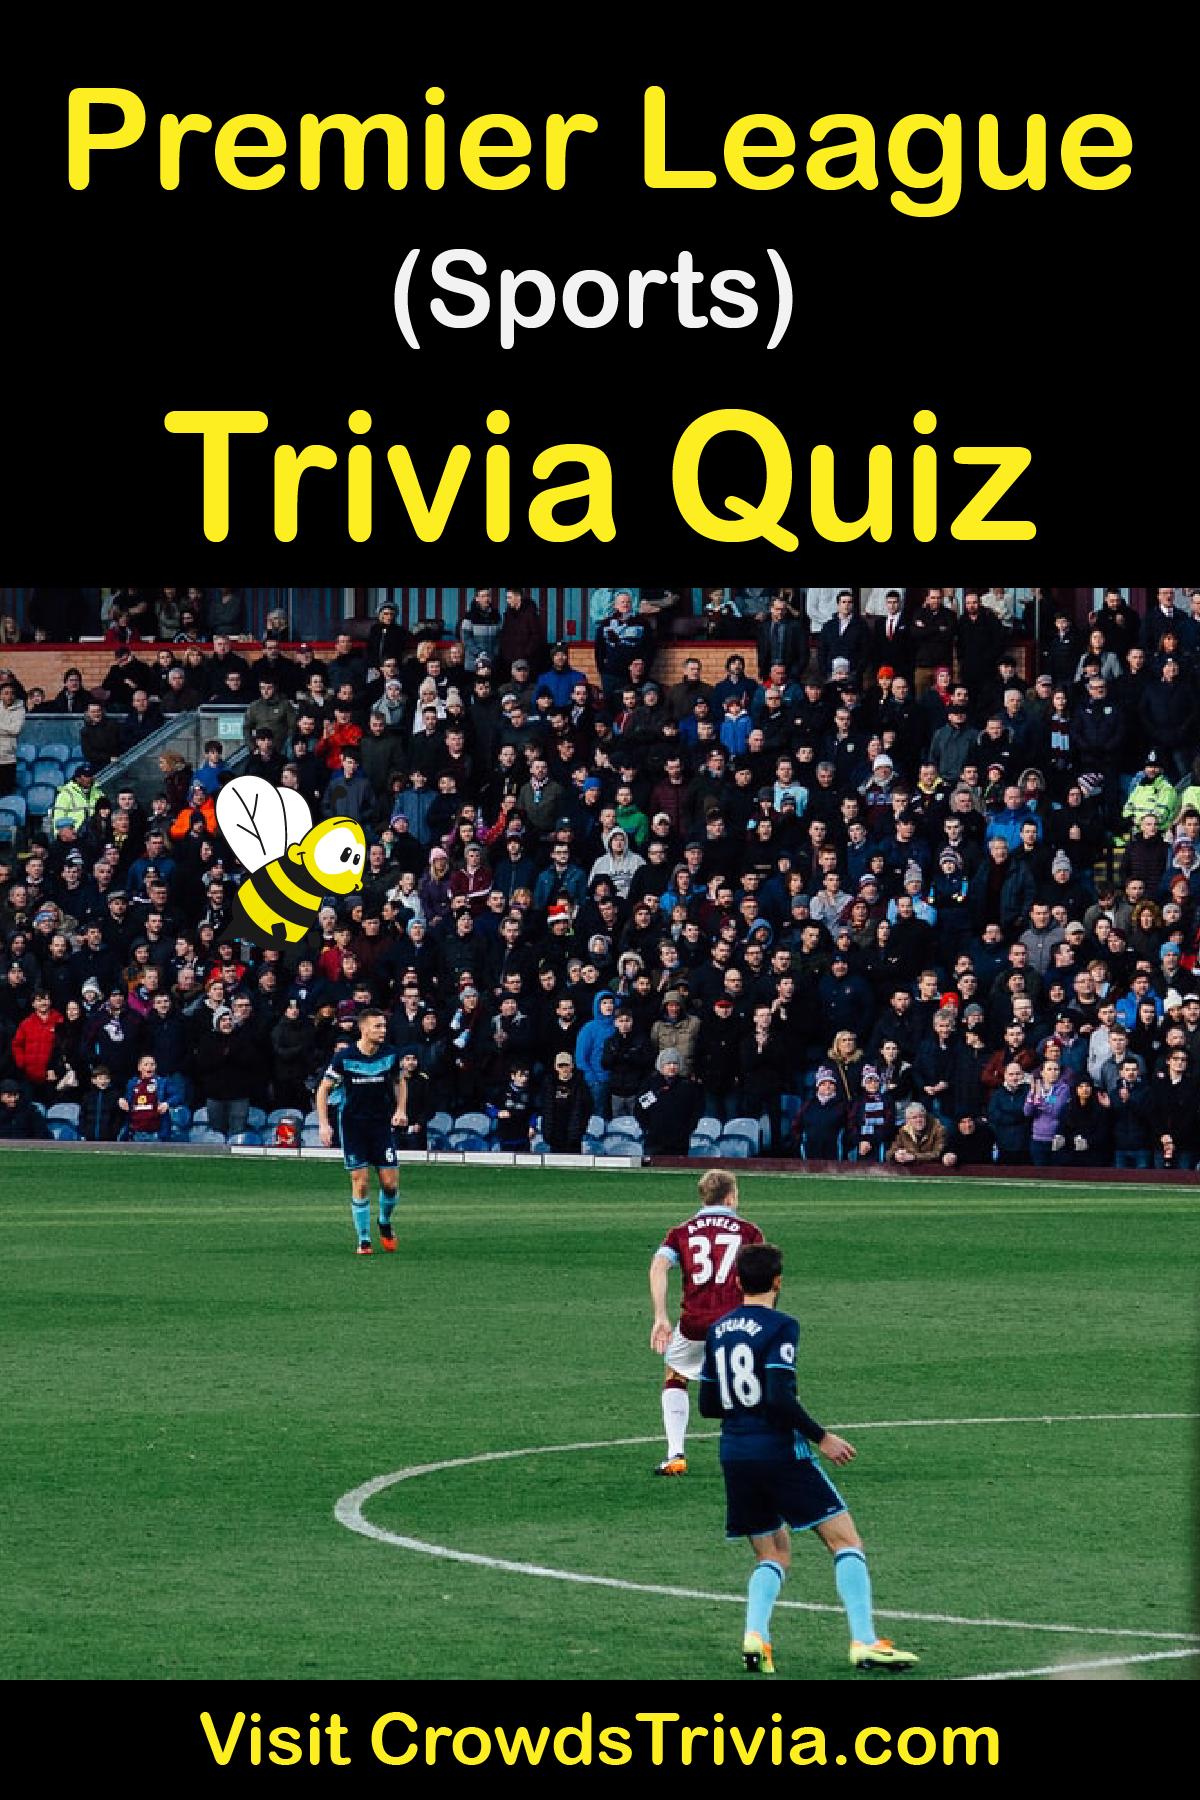 Premier League Trivia Quiz Questions And Answers Fun Facts In 2020 Trivia Quiz Fun Facts Trivia Quiz Questions